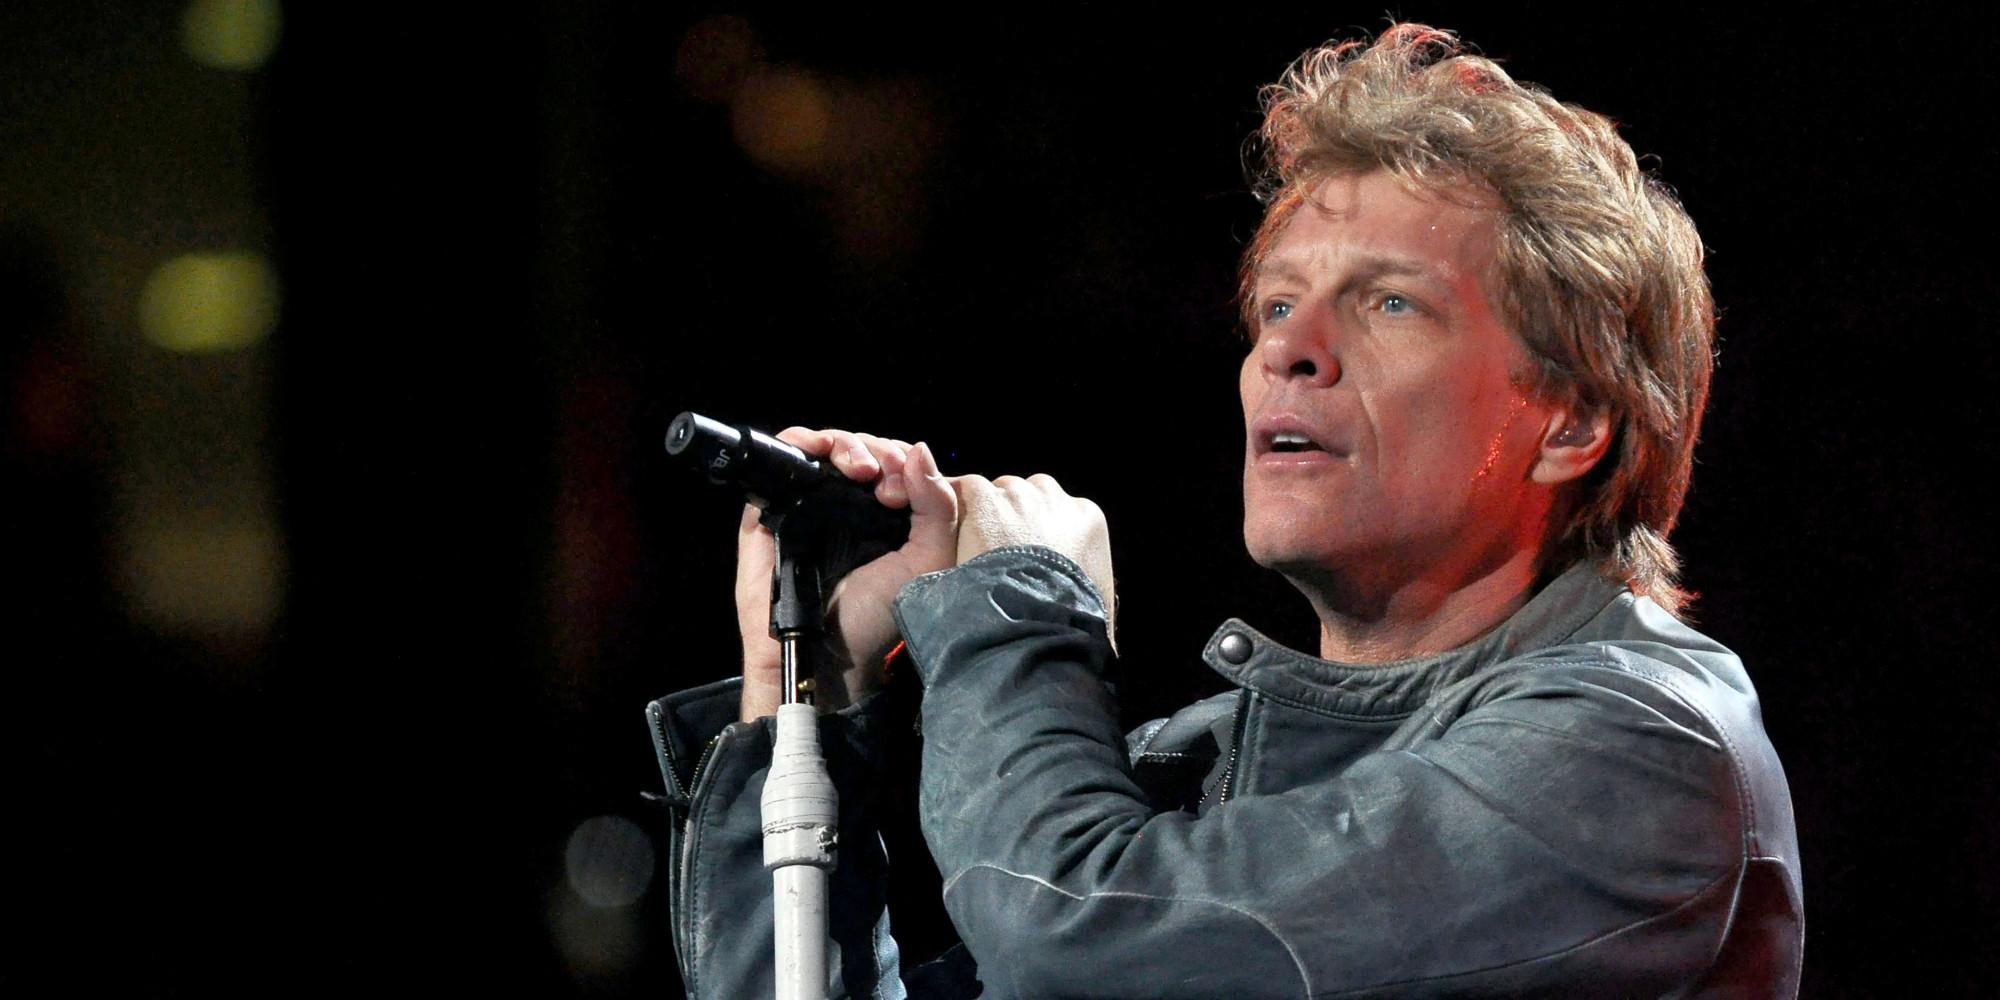 Bon Jovi - It's My Life: Live At The Borgata 2004